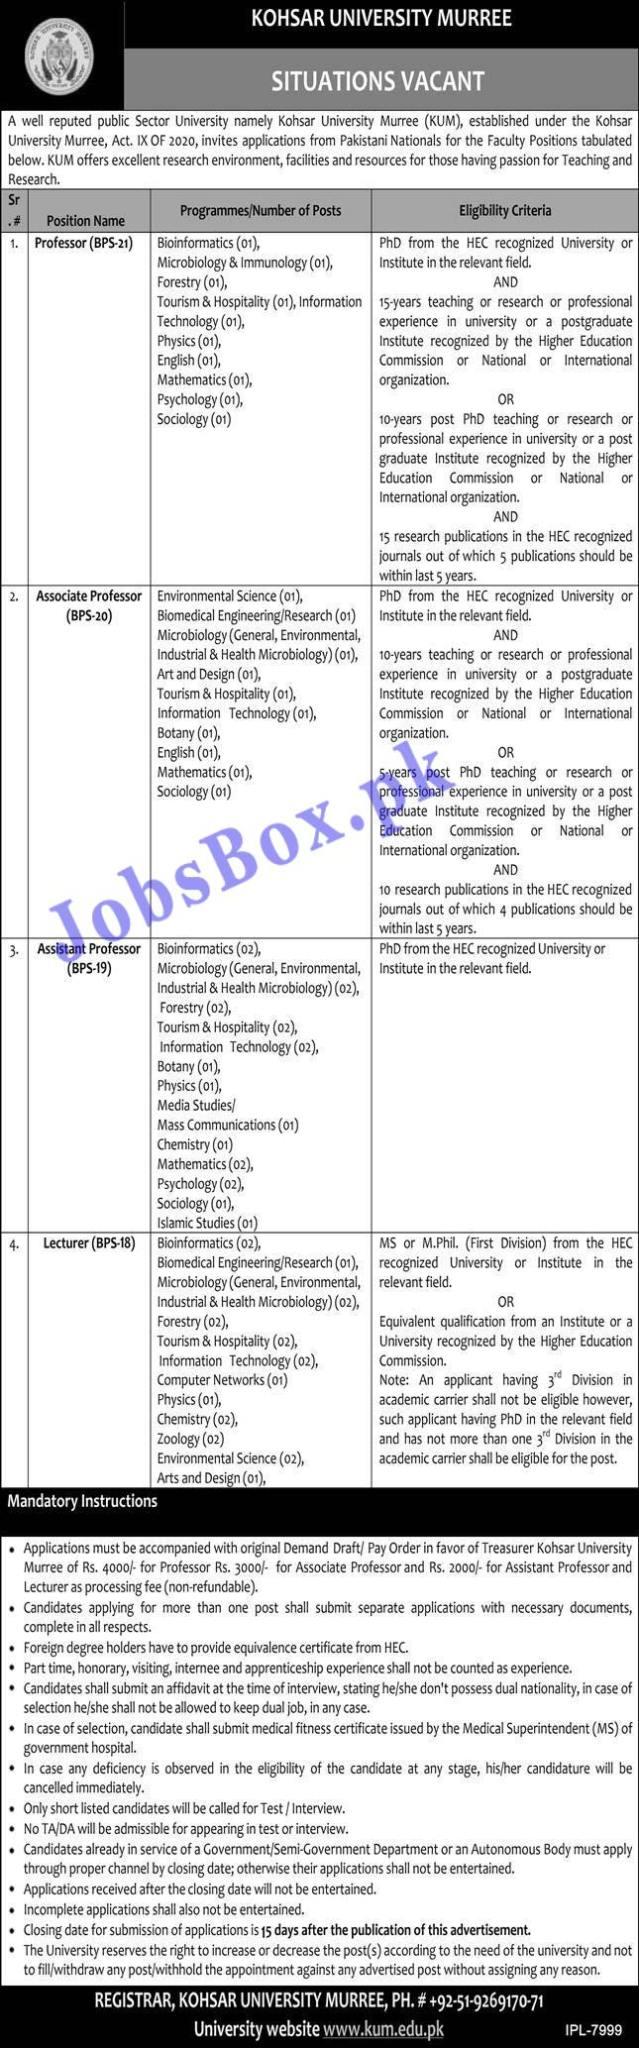 Kohsar University Murree Jobs 2021 KUM Jobs – wwww.kum.edu.pk